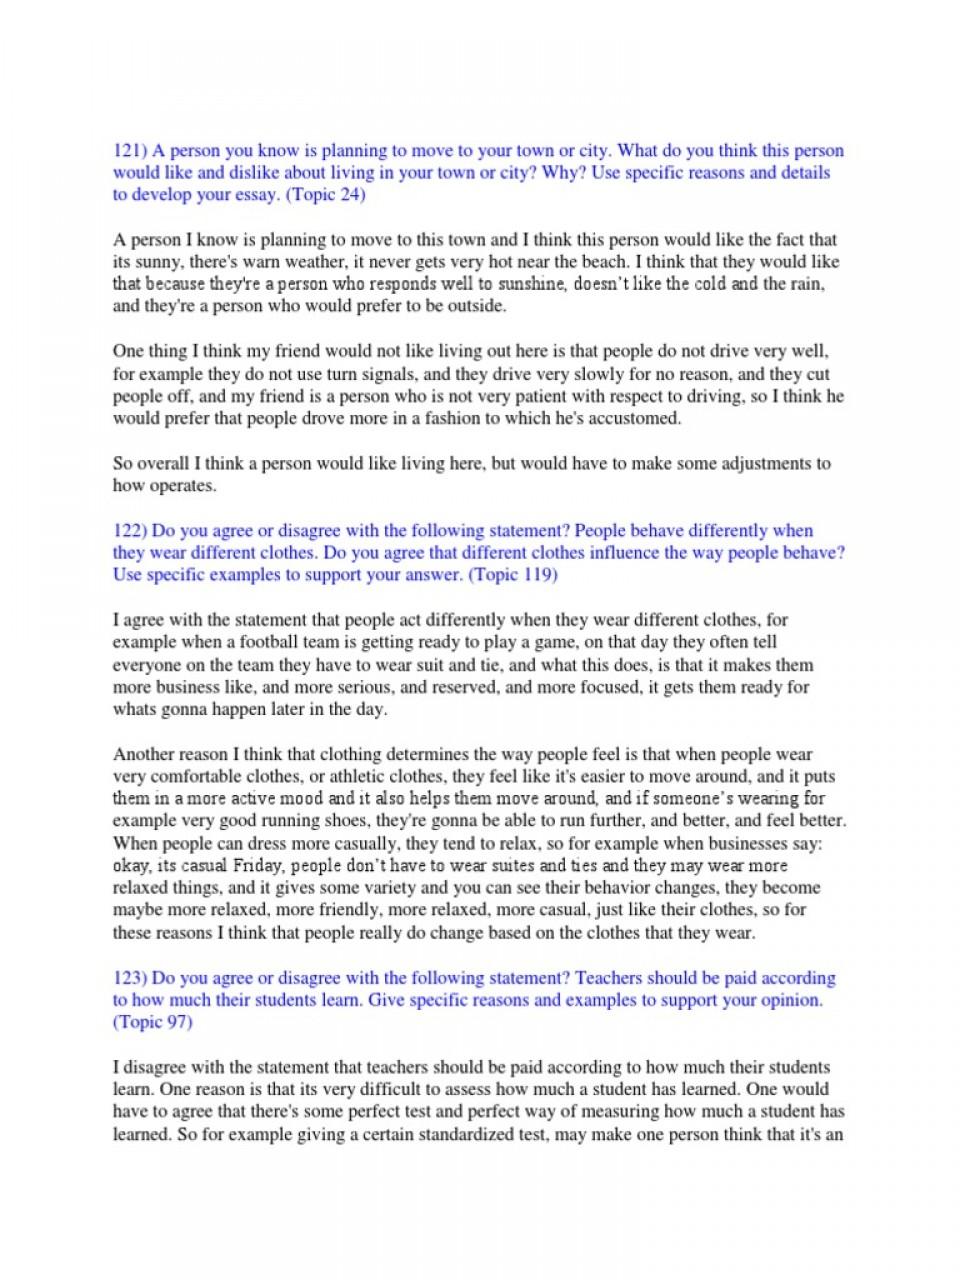 006 Toefl Ibt Essay Topics Example Success Speaking Writing Sample  58517ac4b6d87fb8408b582e Striking 2015960